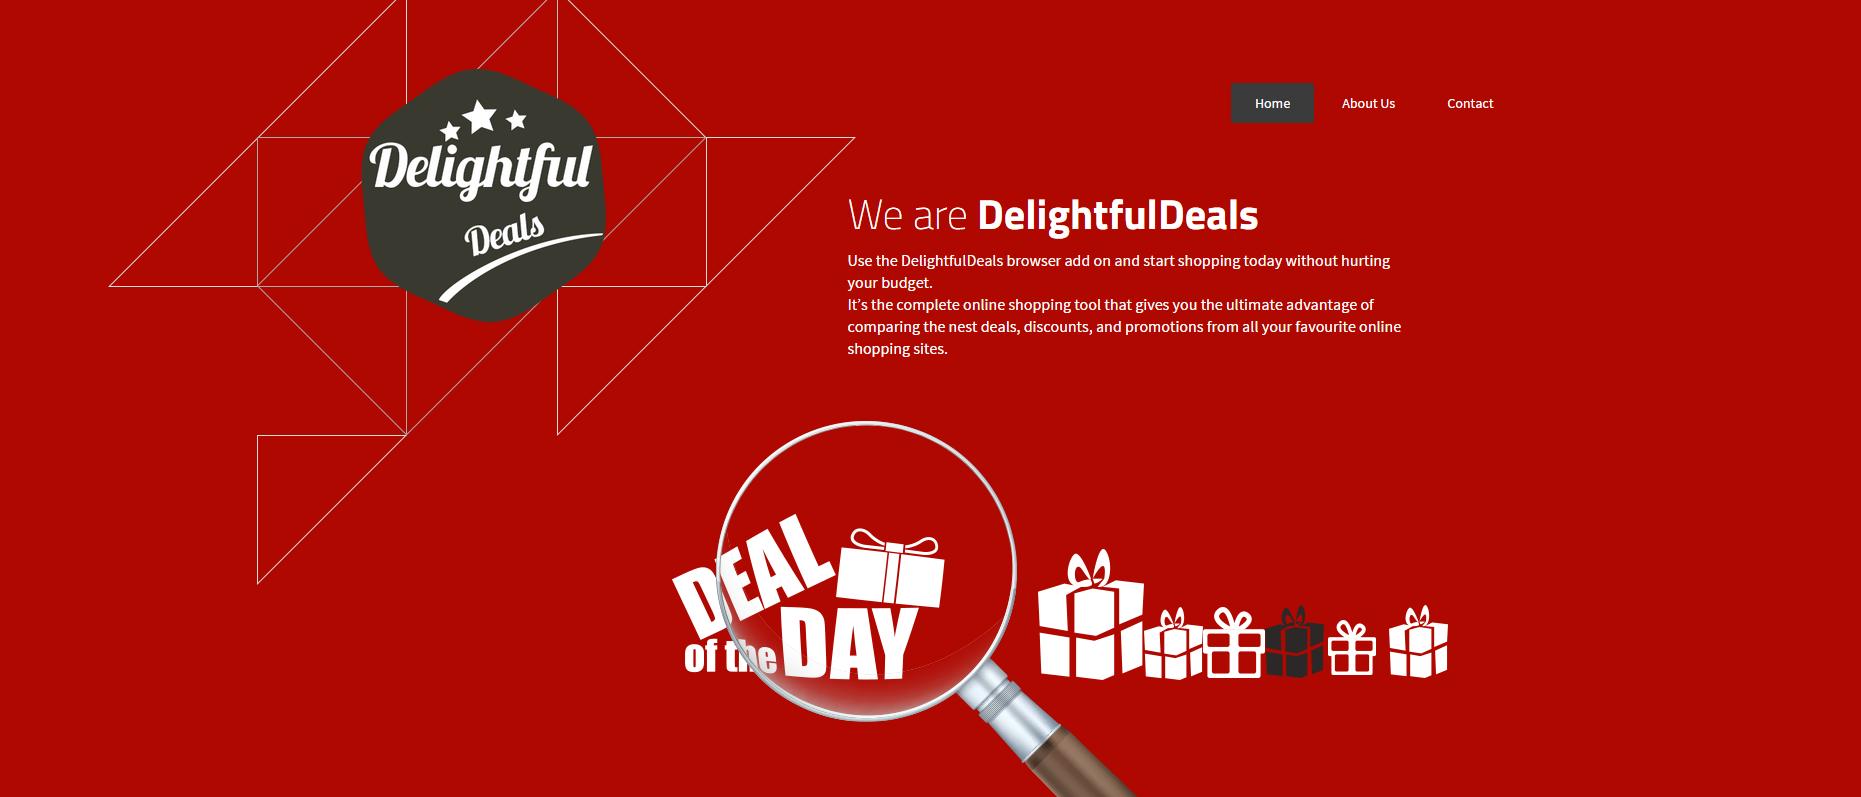 DelightfulDeals ads